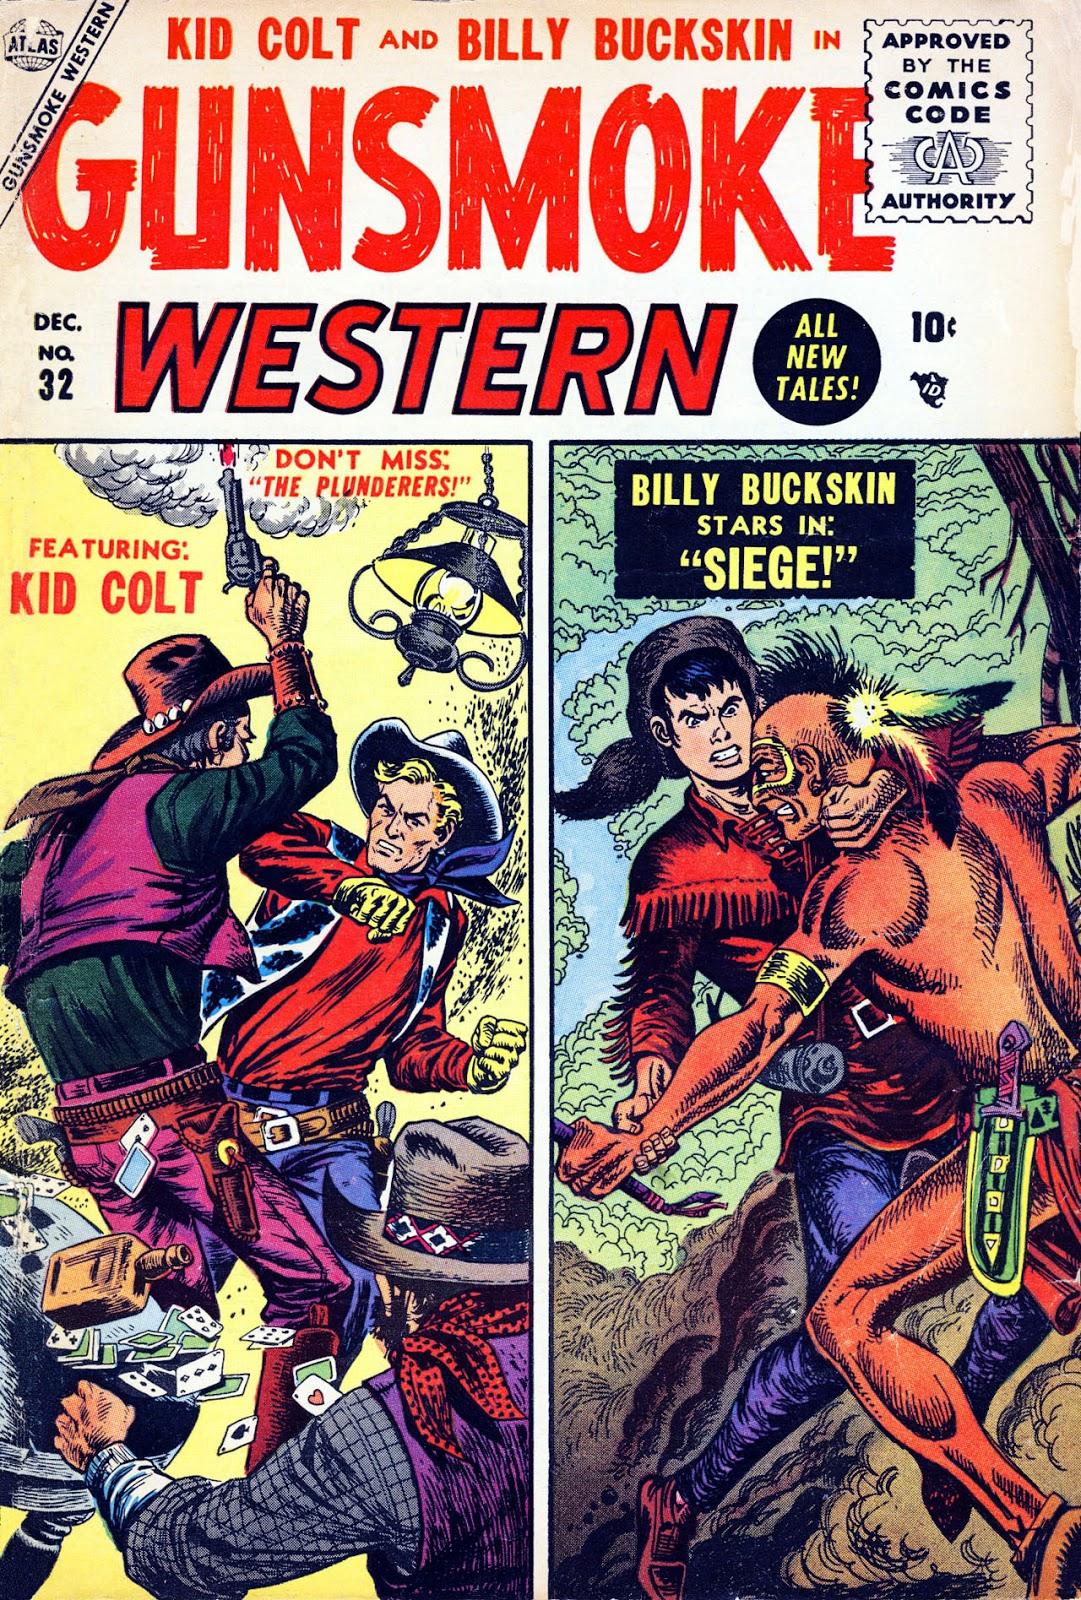 Gunsmoke Western issue 32 - Page 1